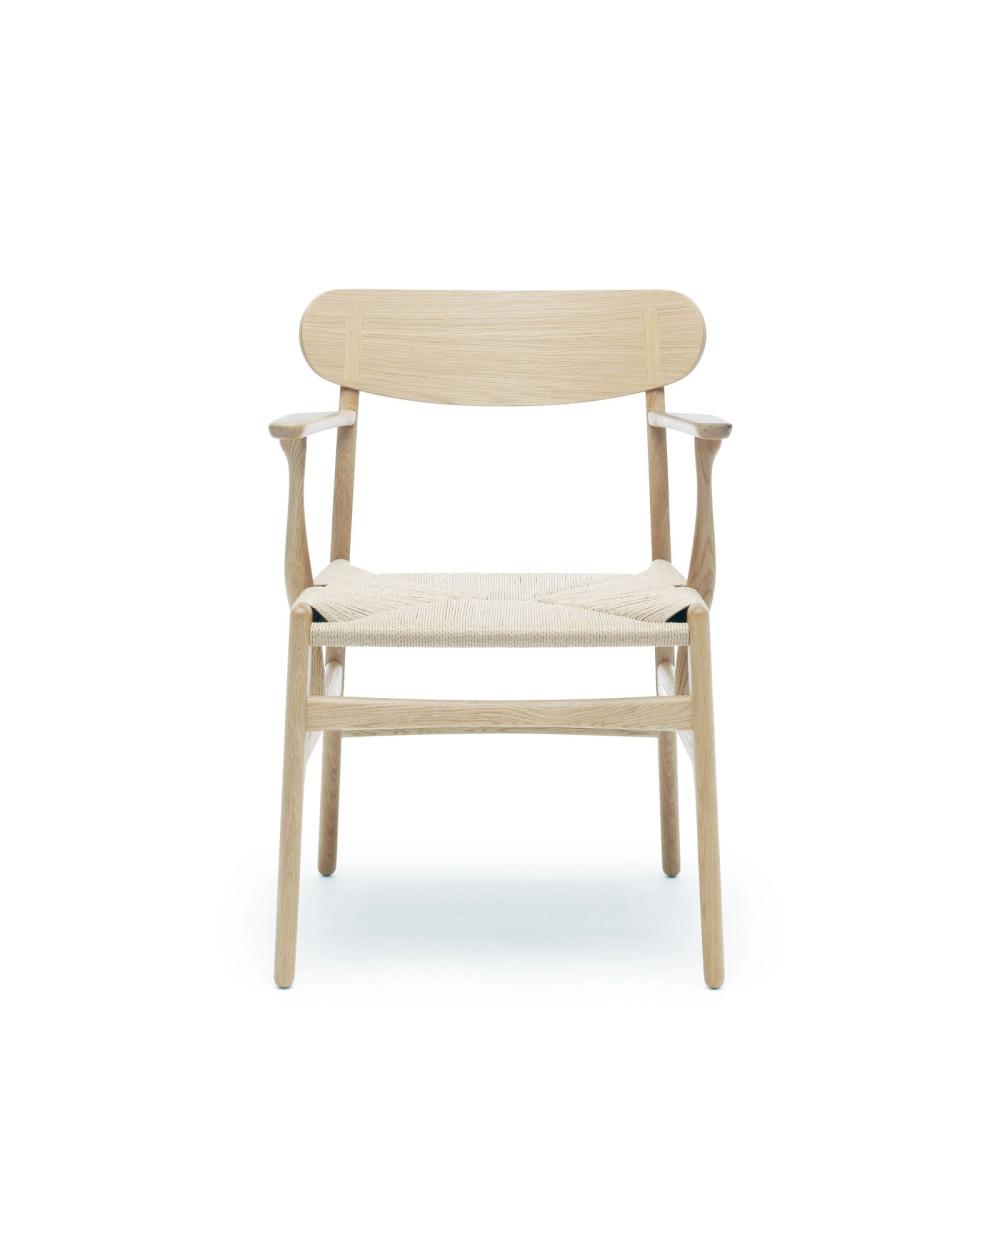 CH26 chair, Hans J. Wegner